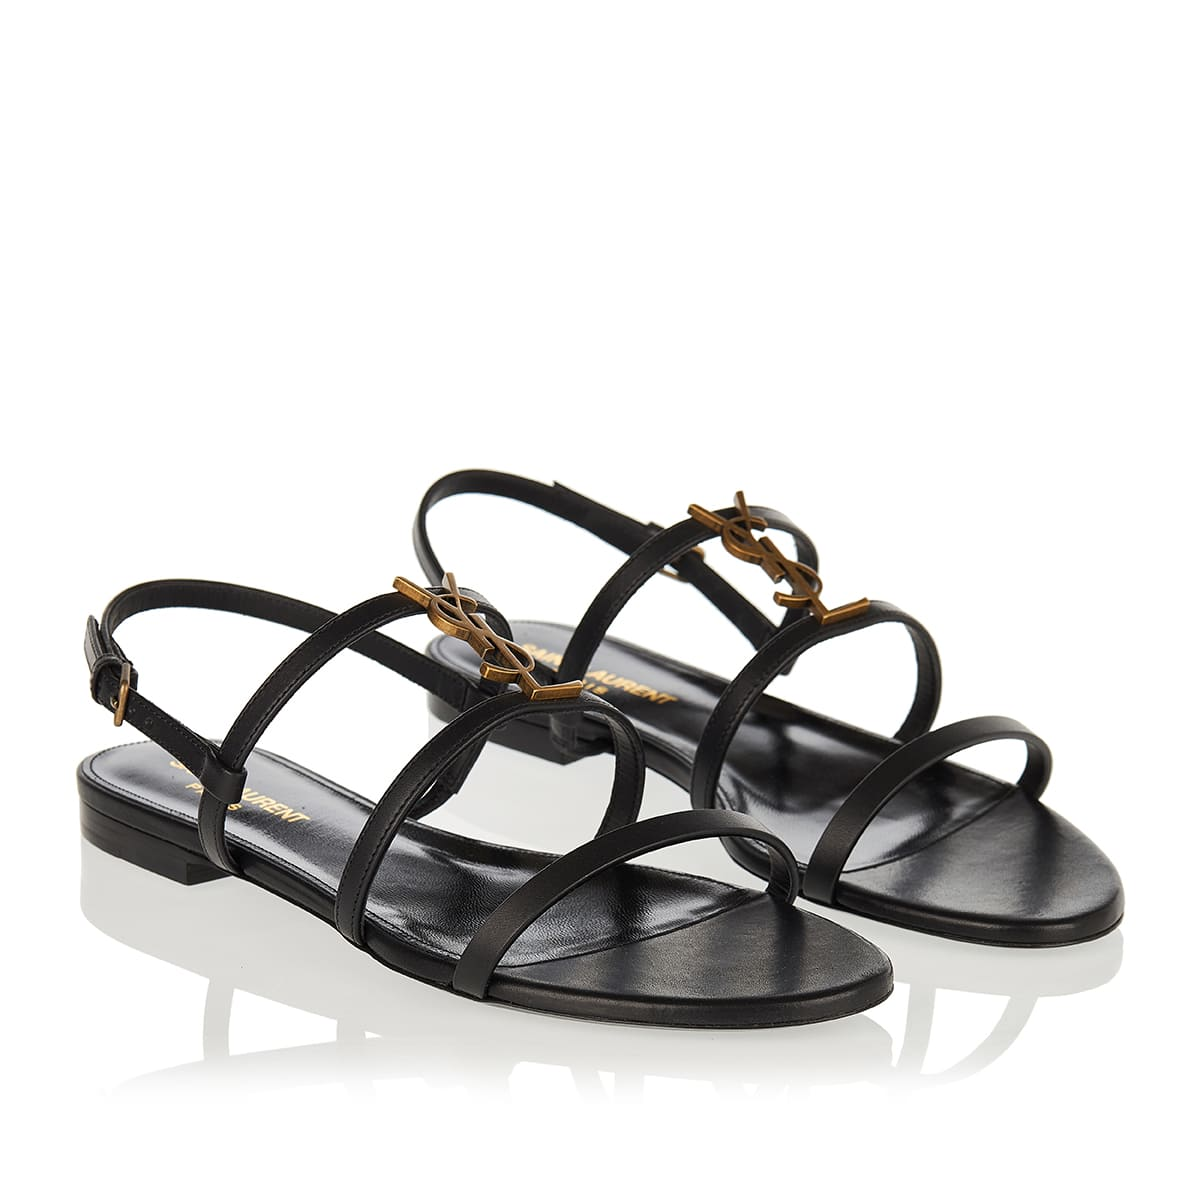 Cassandra leather flat sandals